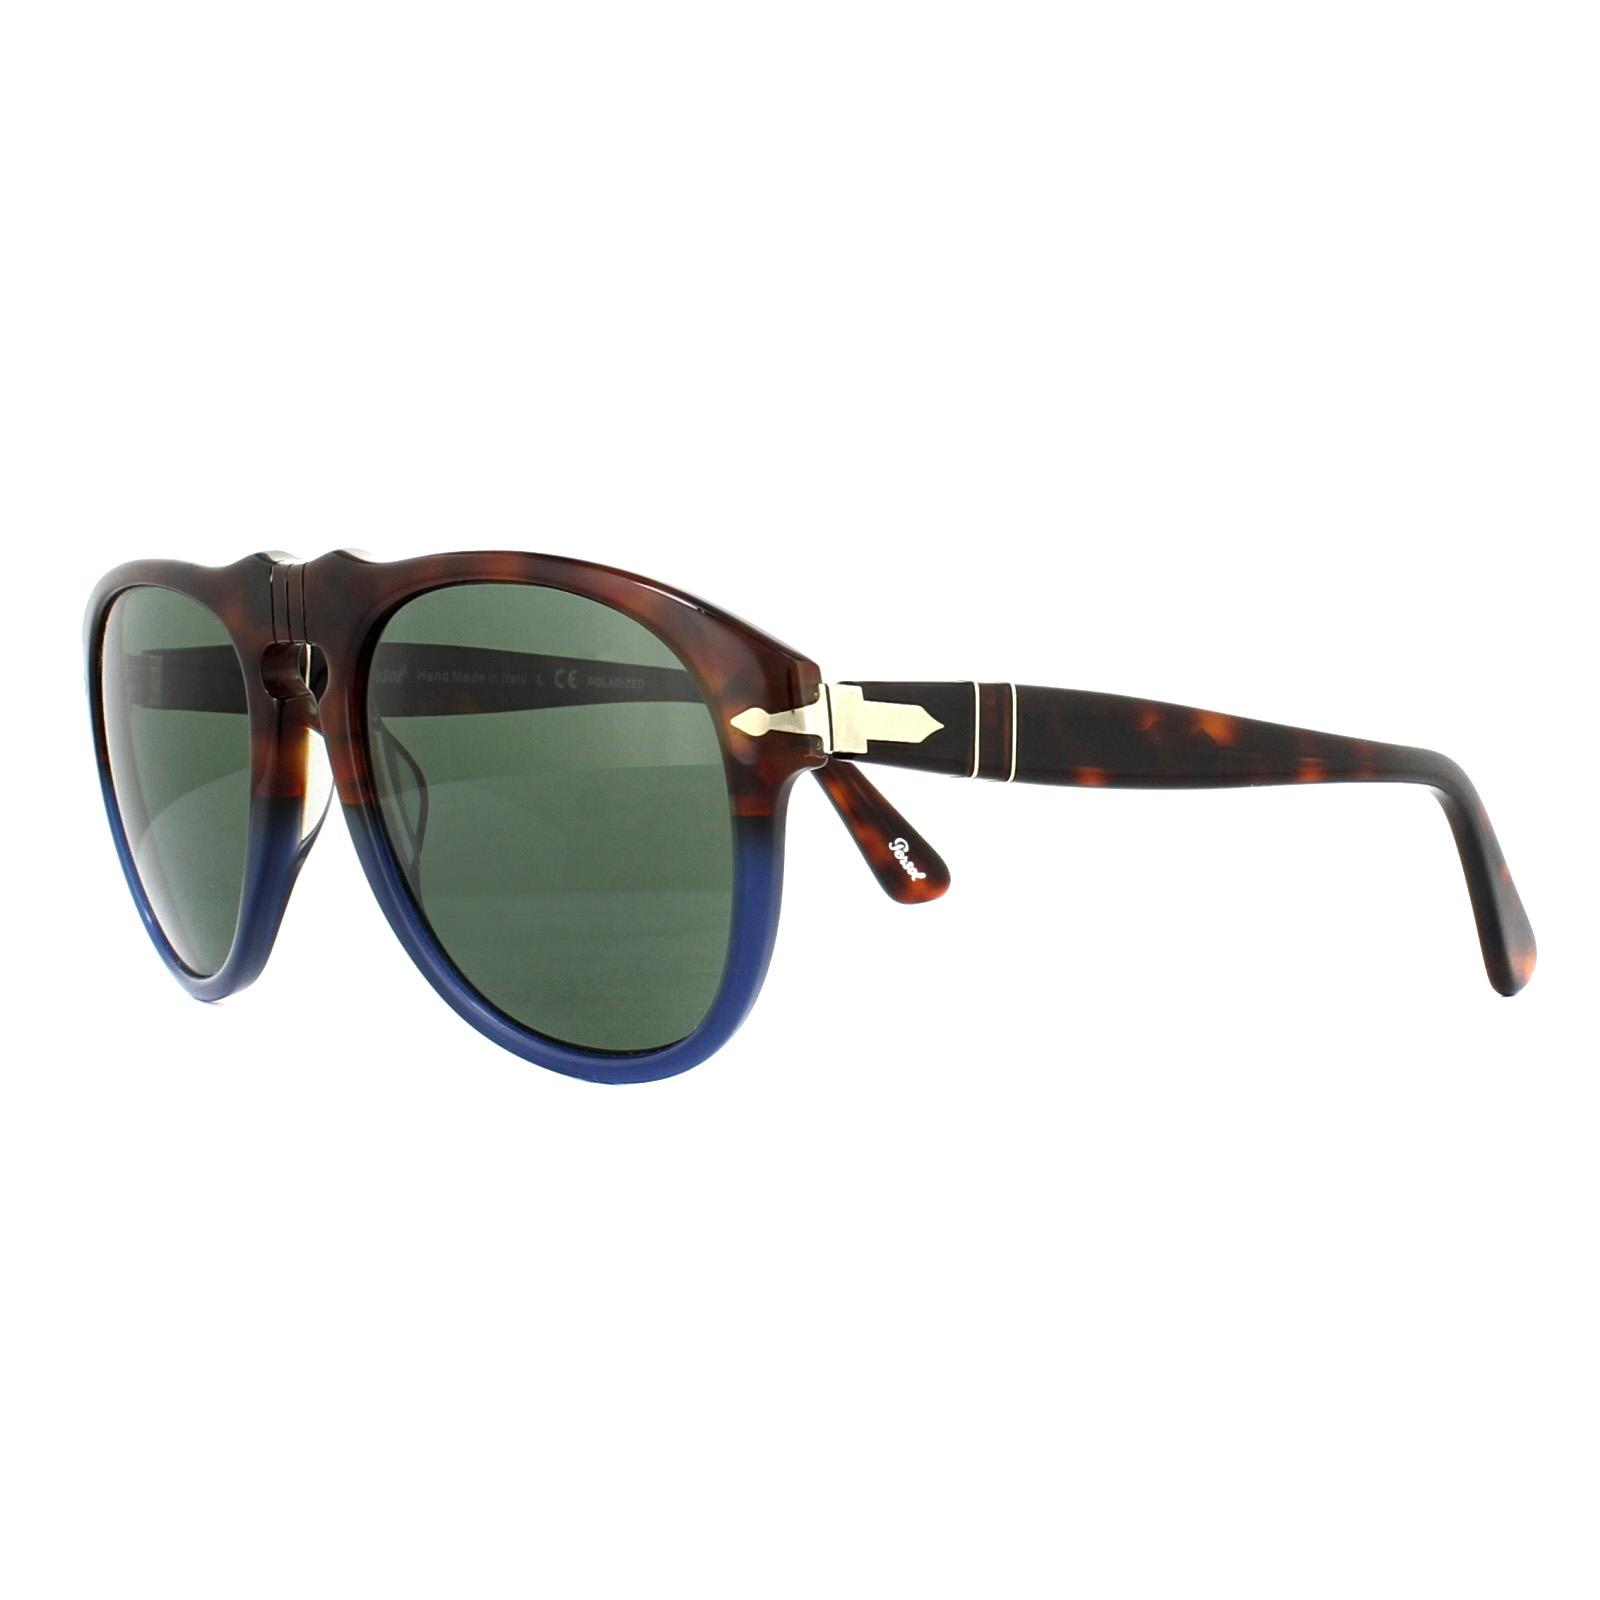 00b80d9c68c Sentinel Persol Sunglasses 649 102258 Terra E Oceano Grey Polarized